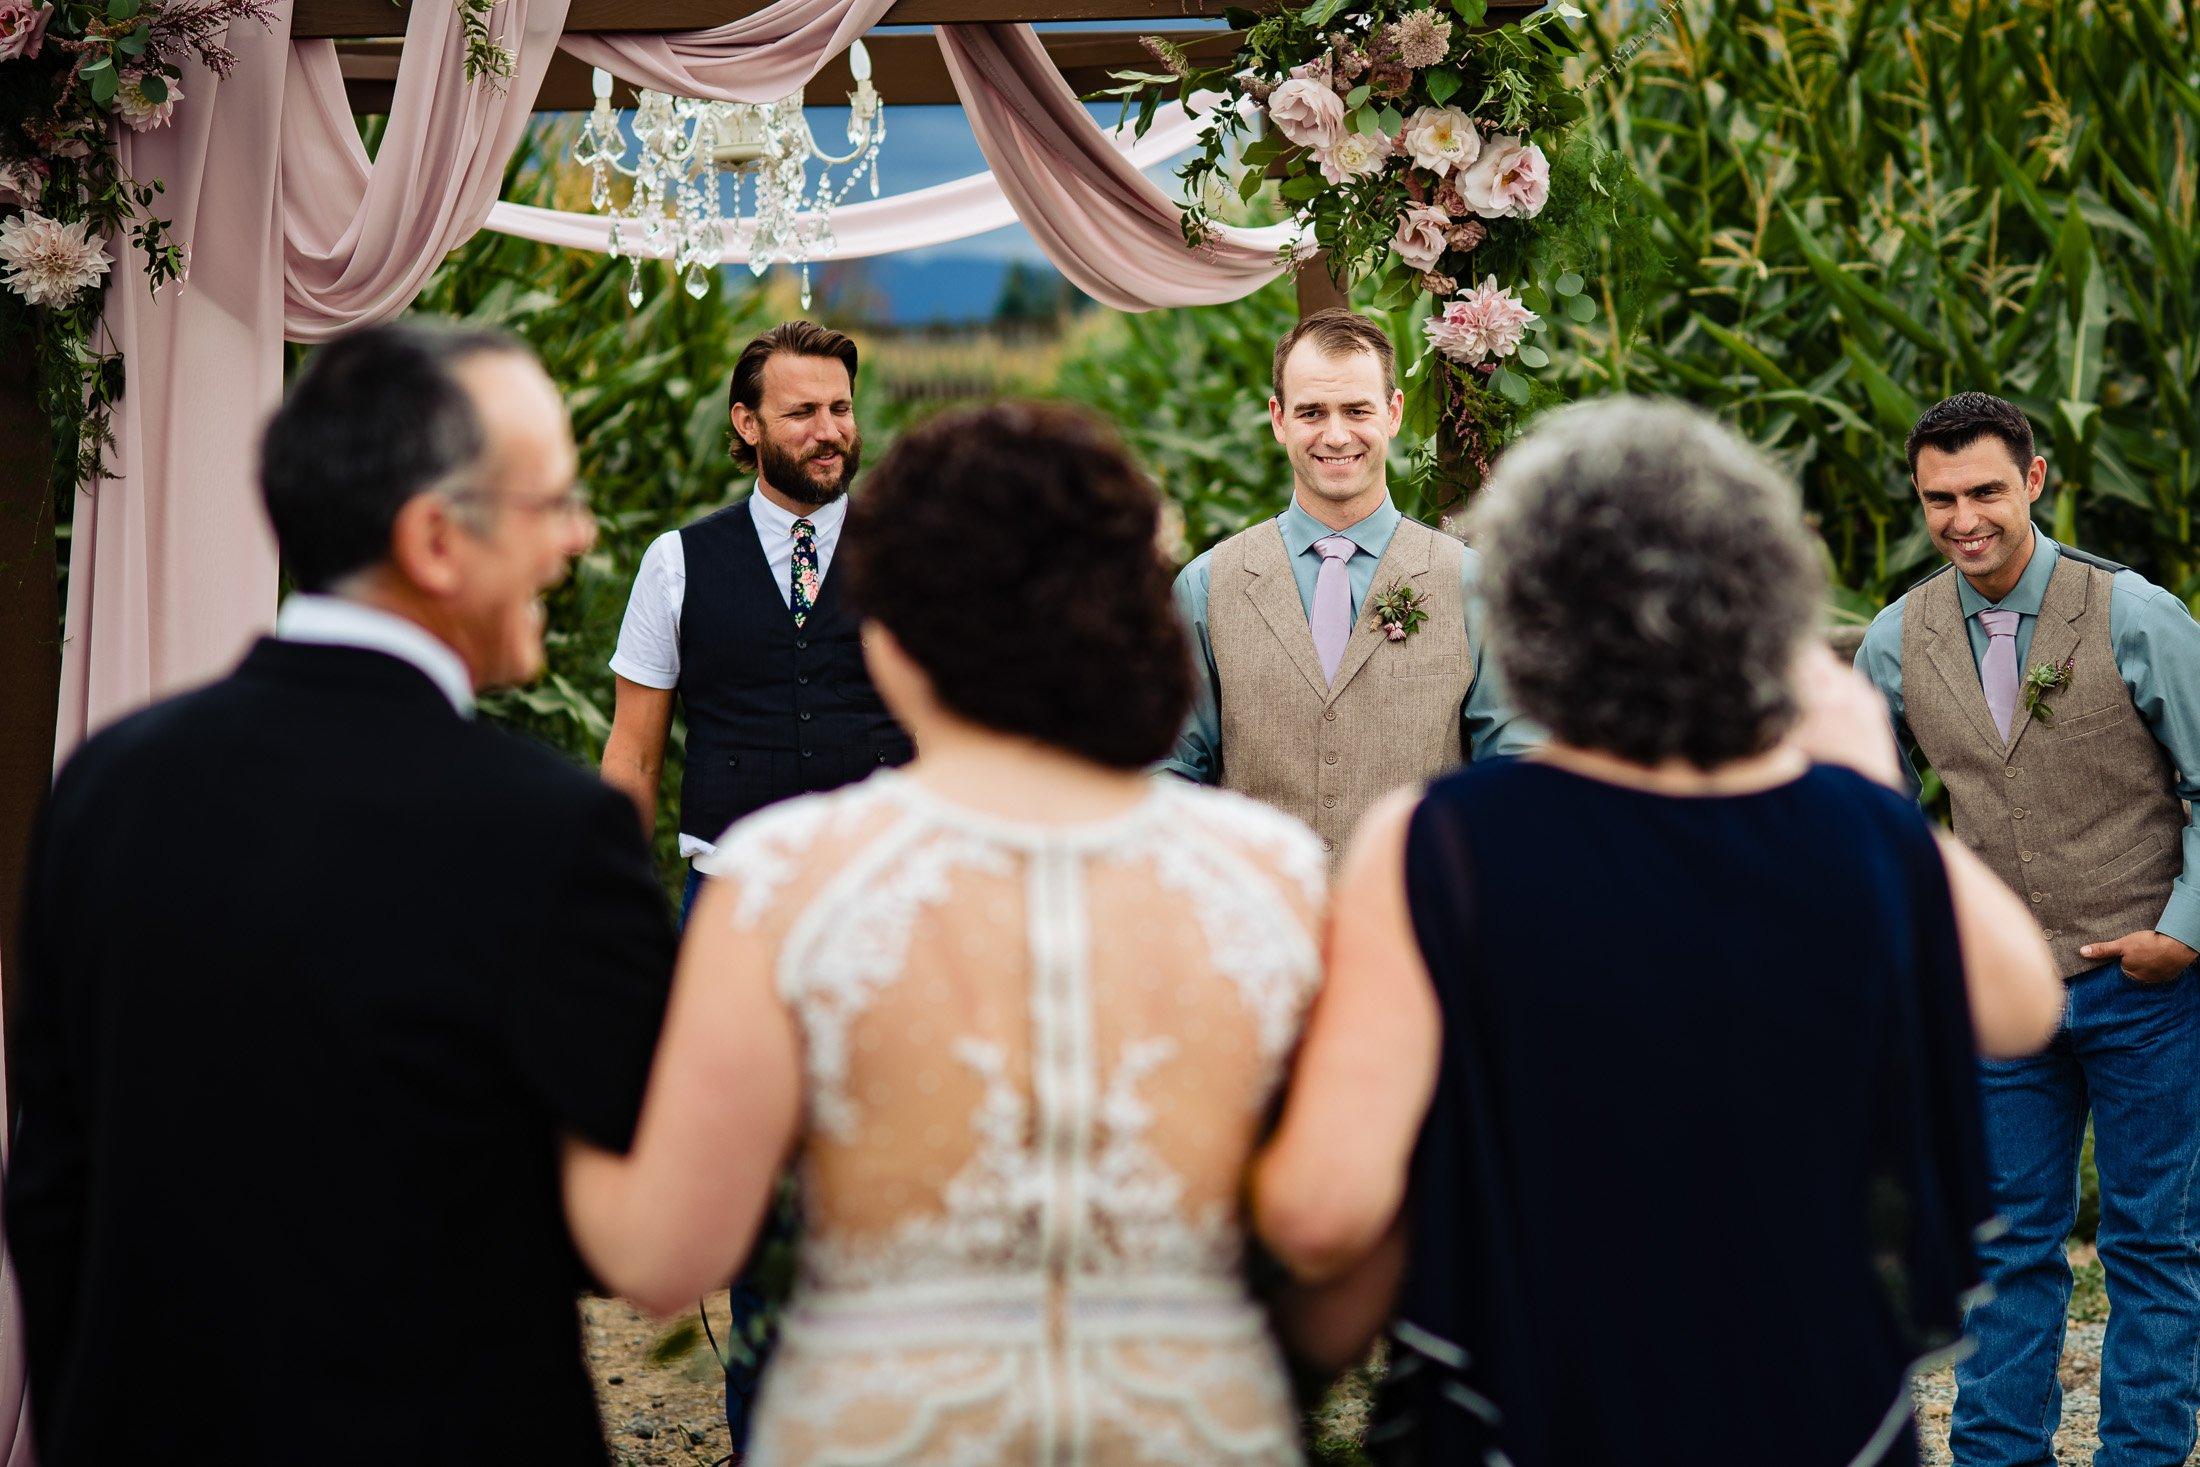 006 - outdoor wedding ceremony vancouver